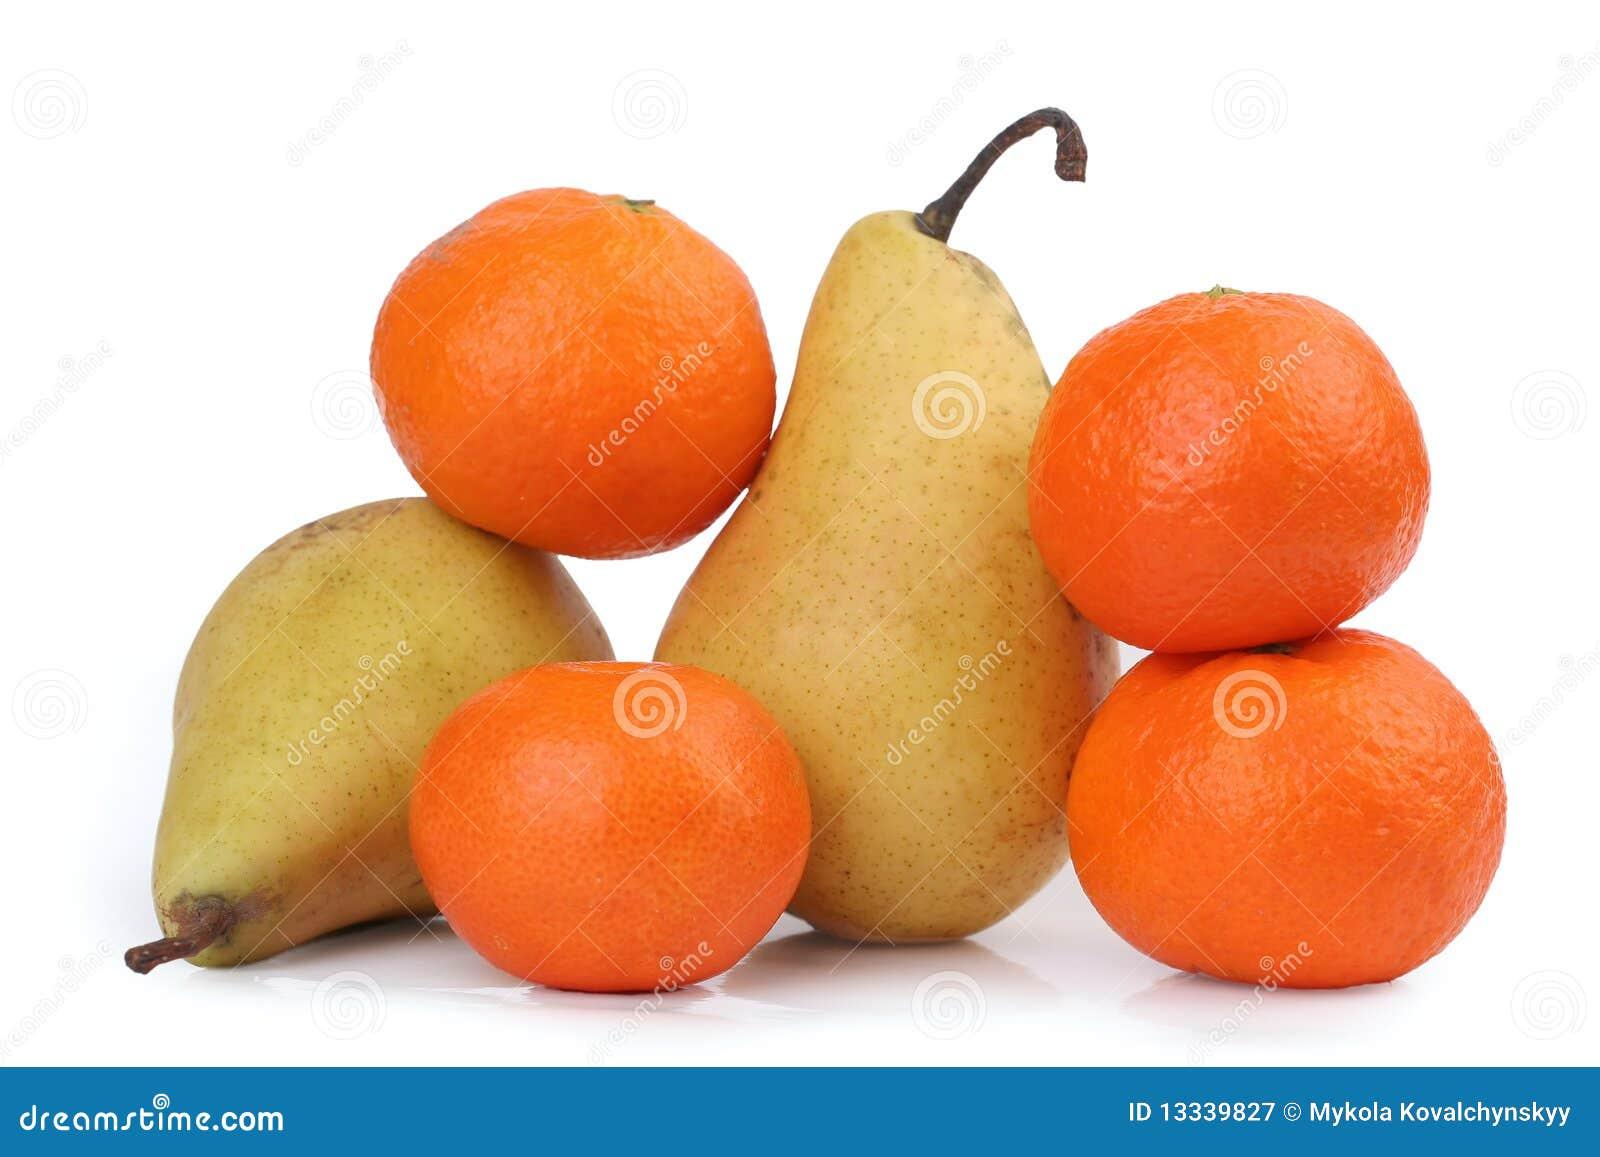 Mandarino una pera